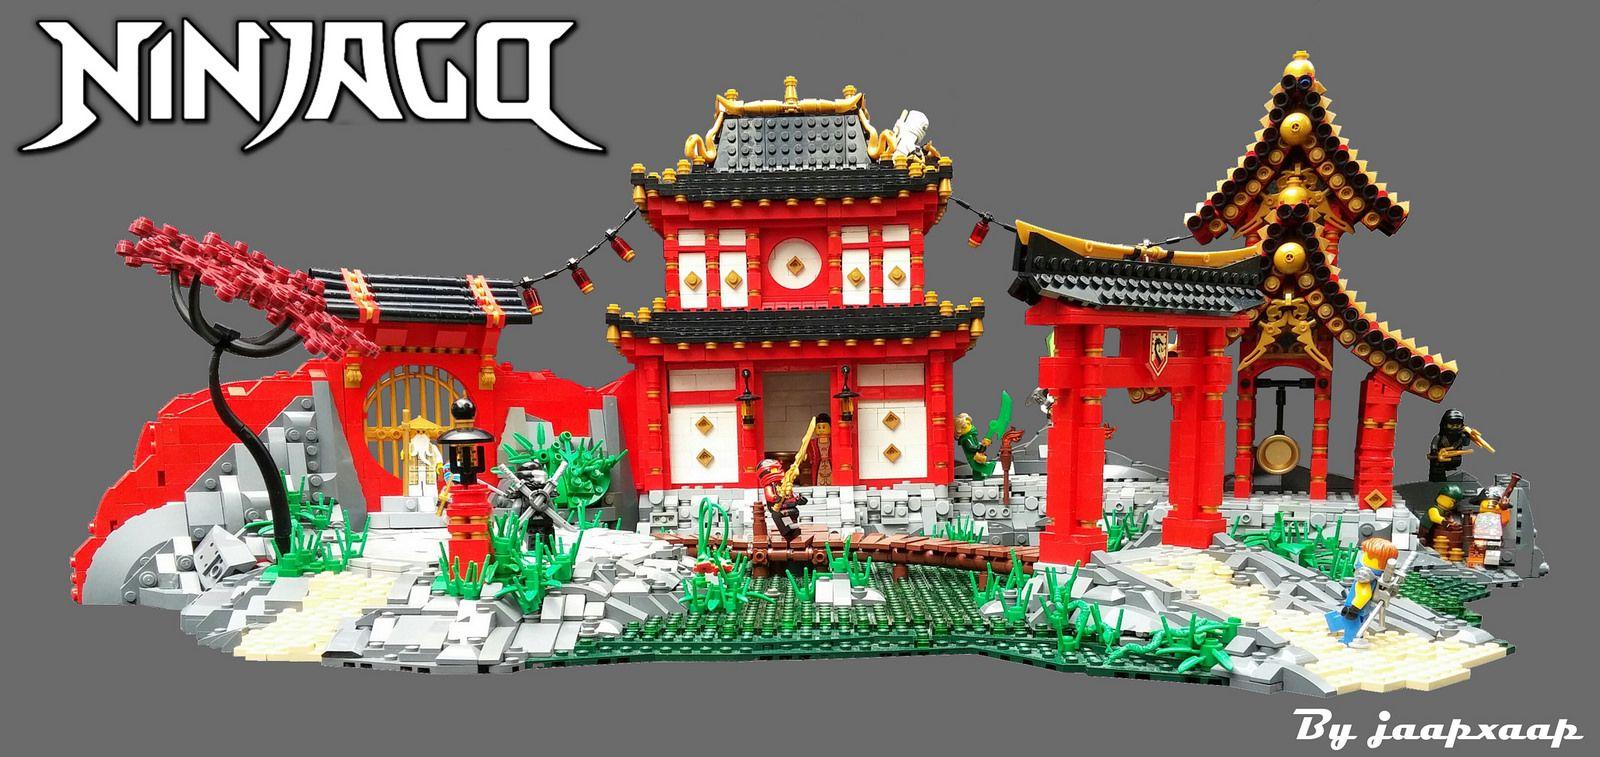 Ninjago Swamp City Lego Ninjago City Lego Architecture Lego Building